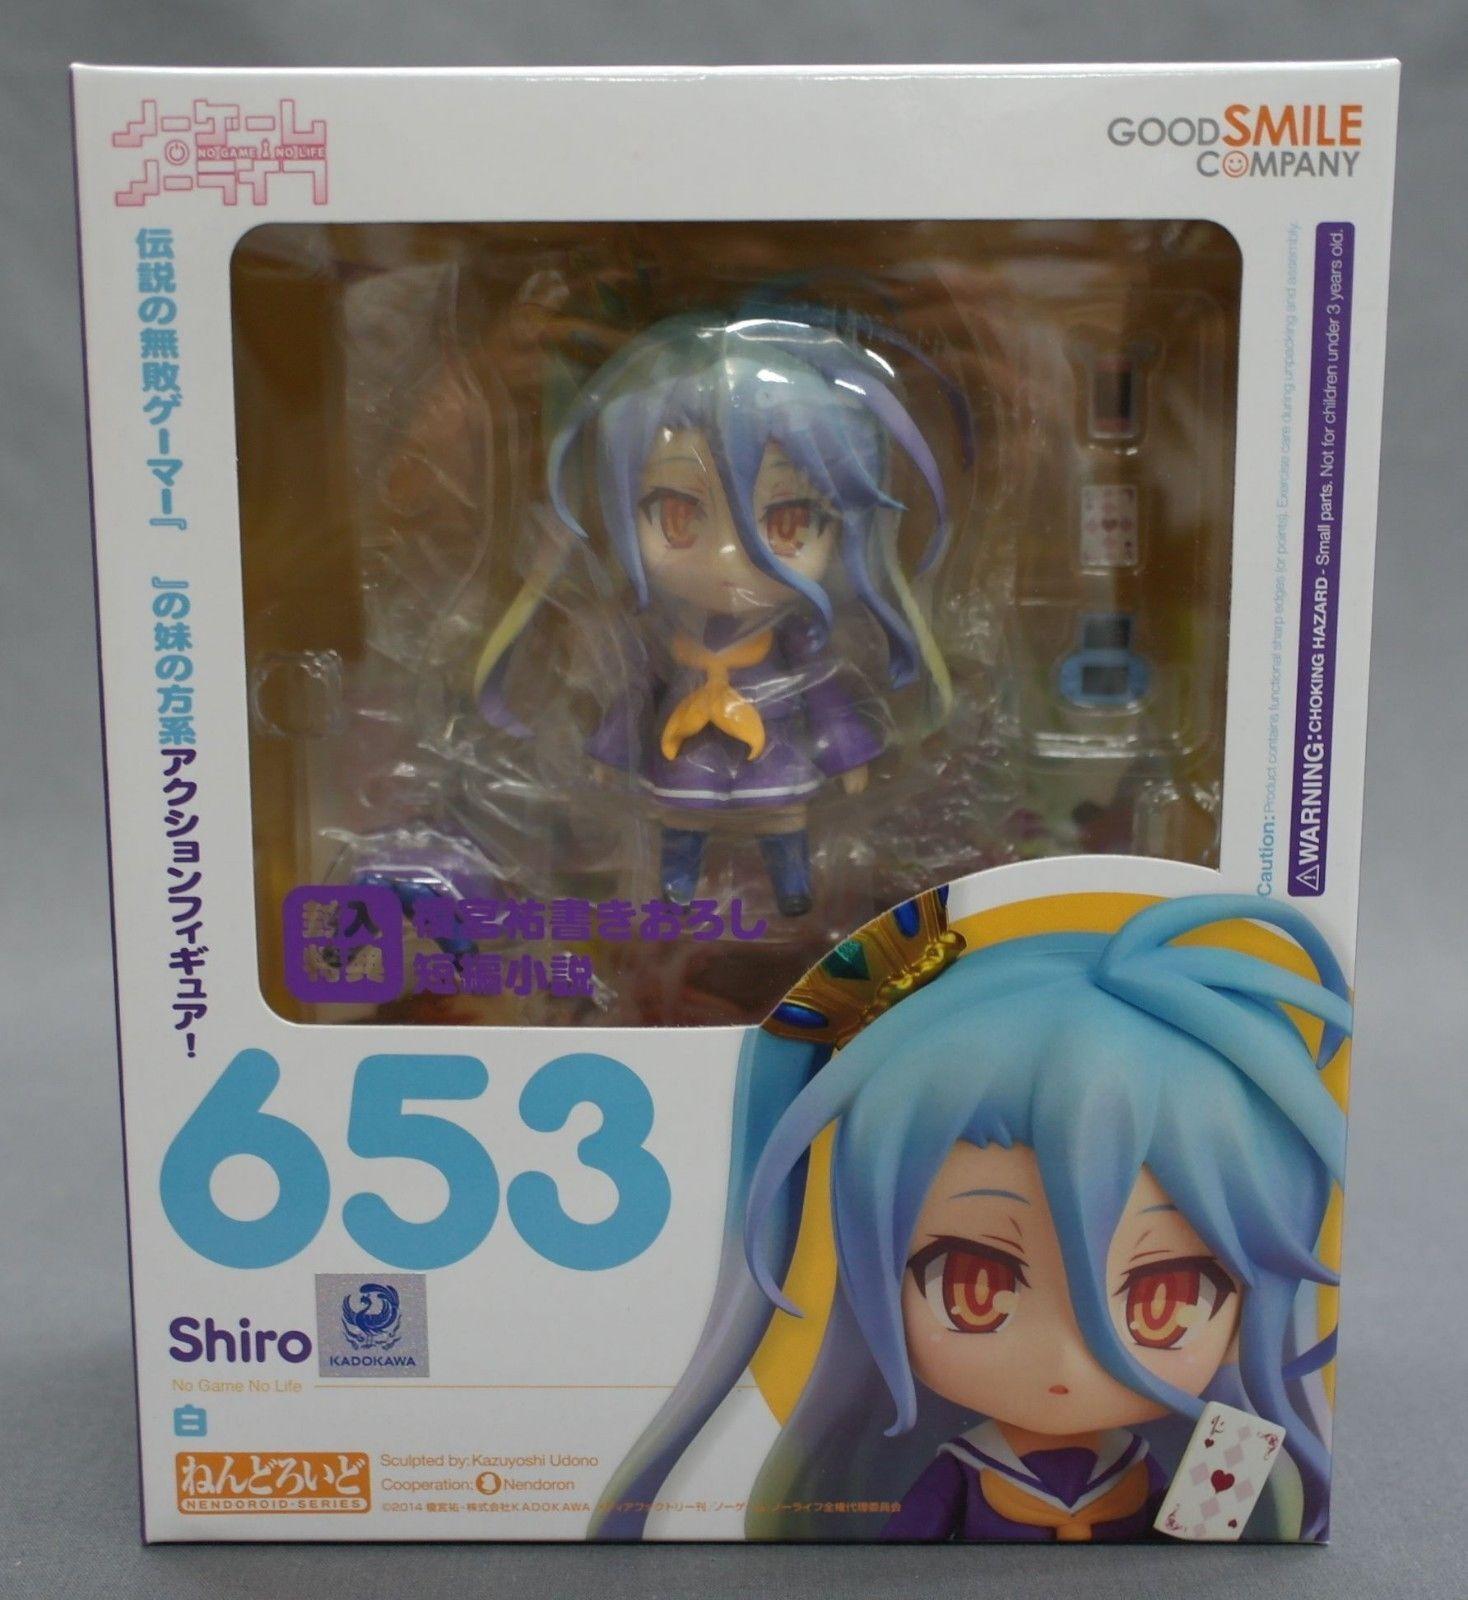 Nendoroid No Game No Life Shiro Good Smile Company Japan NEW